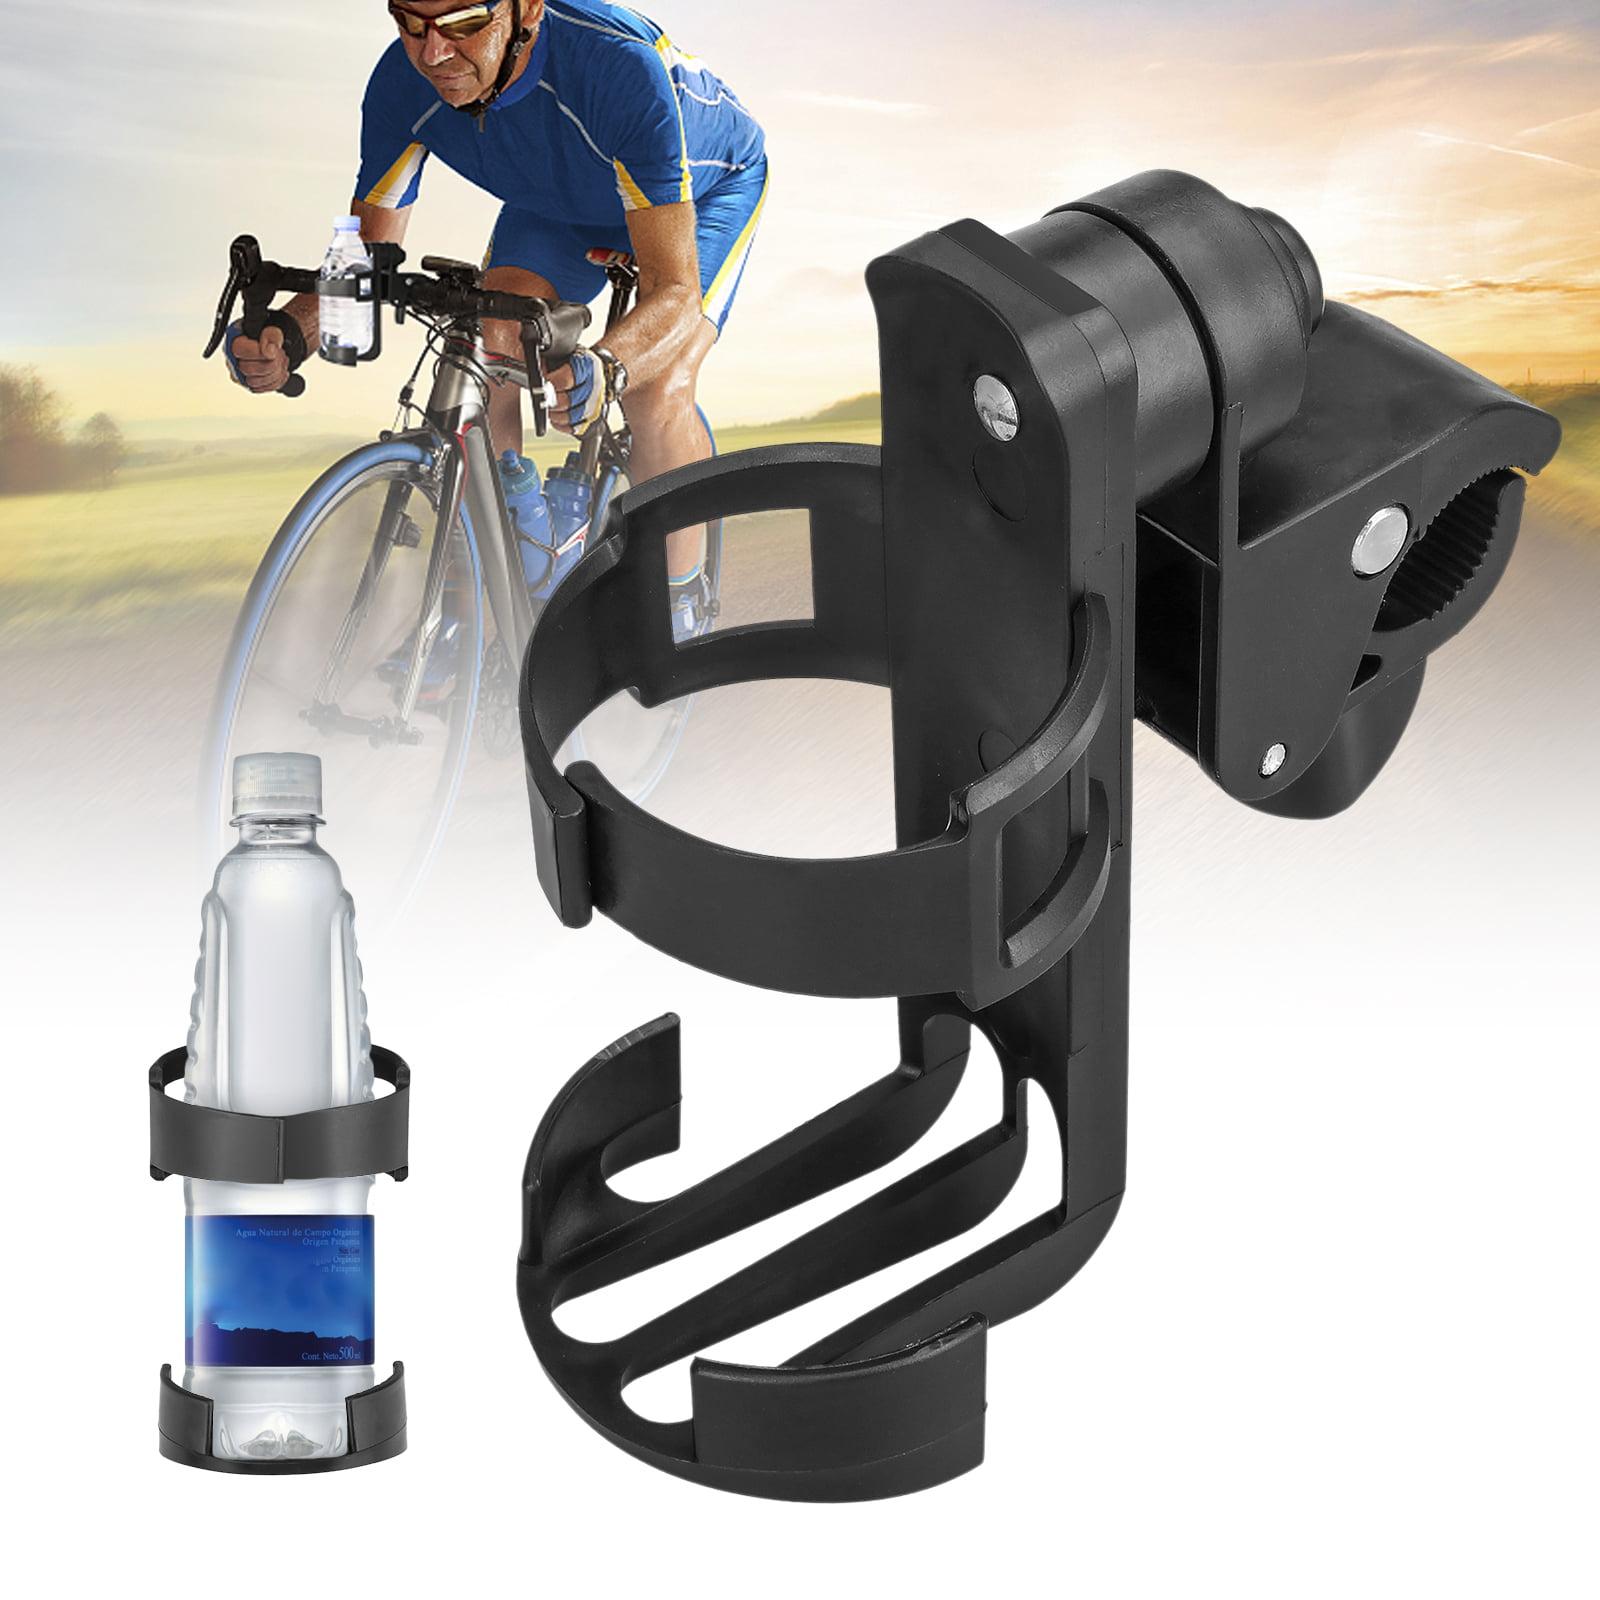 Quick Release Drink Bottle Cup Holder Handlebar Mount Cage for Motorcycle Bike ATV